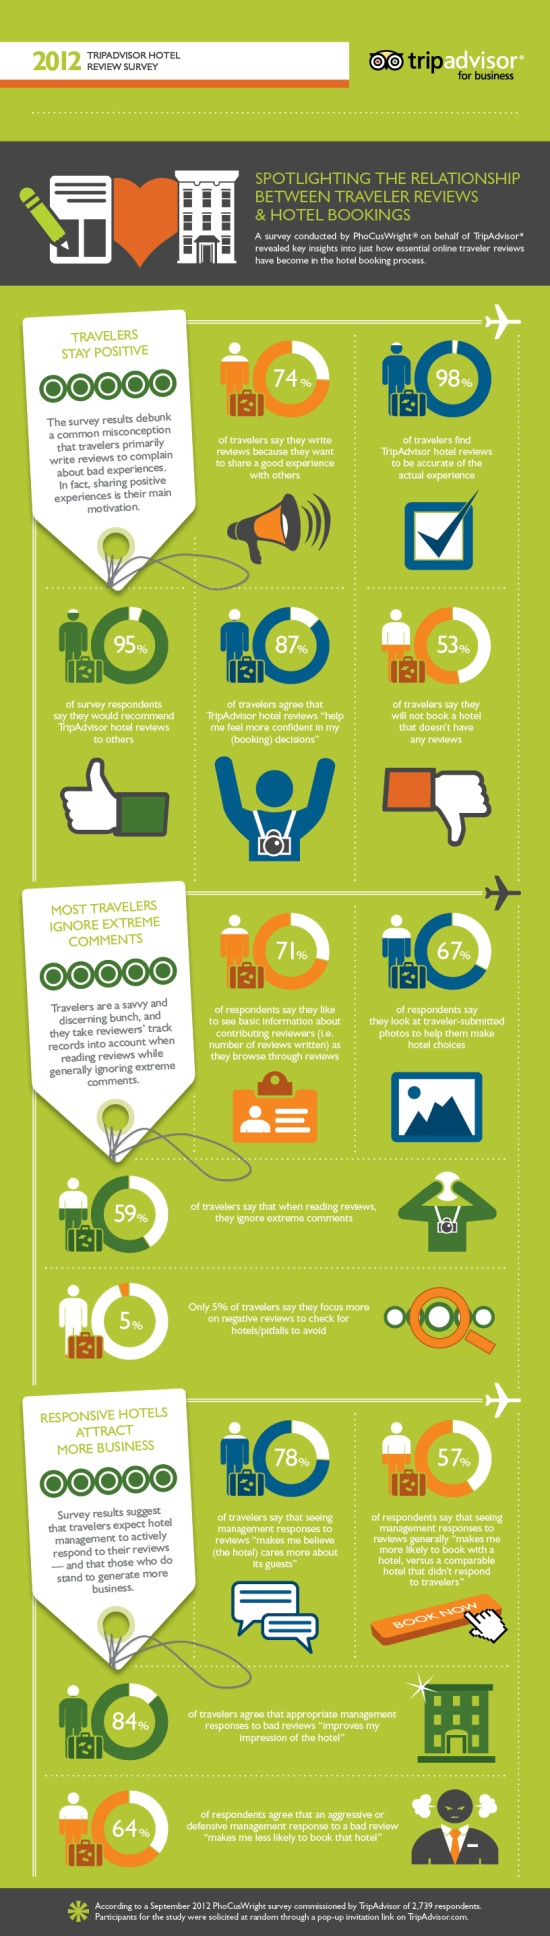 reputazione-online-turistica-infografica